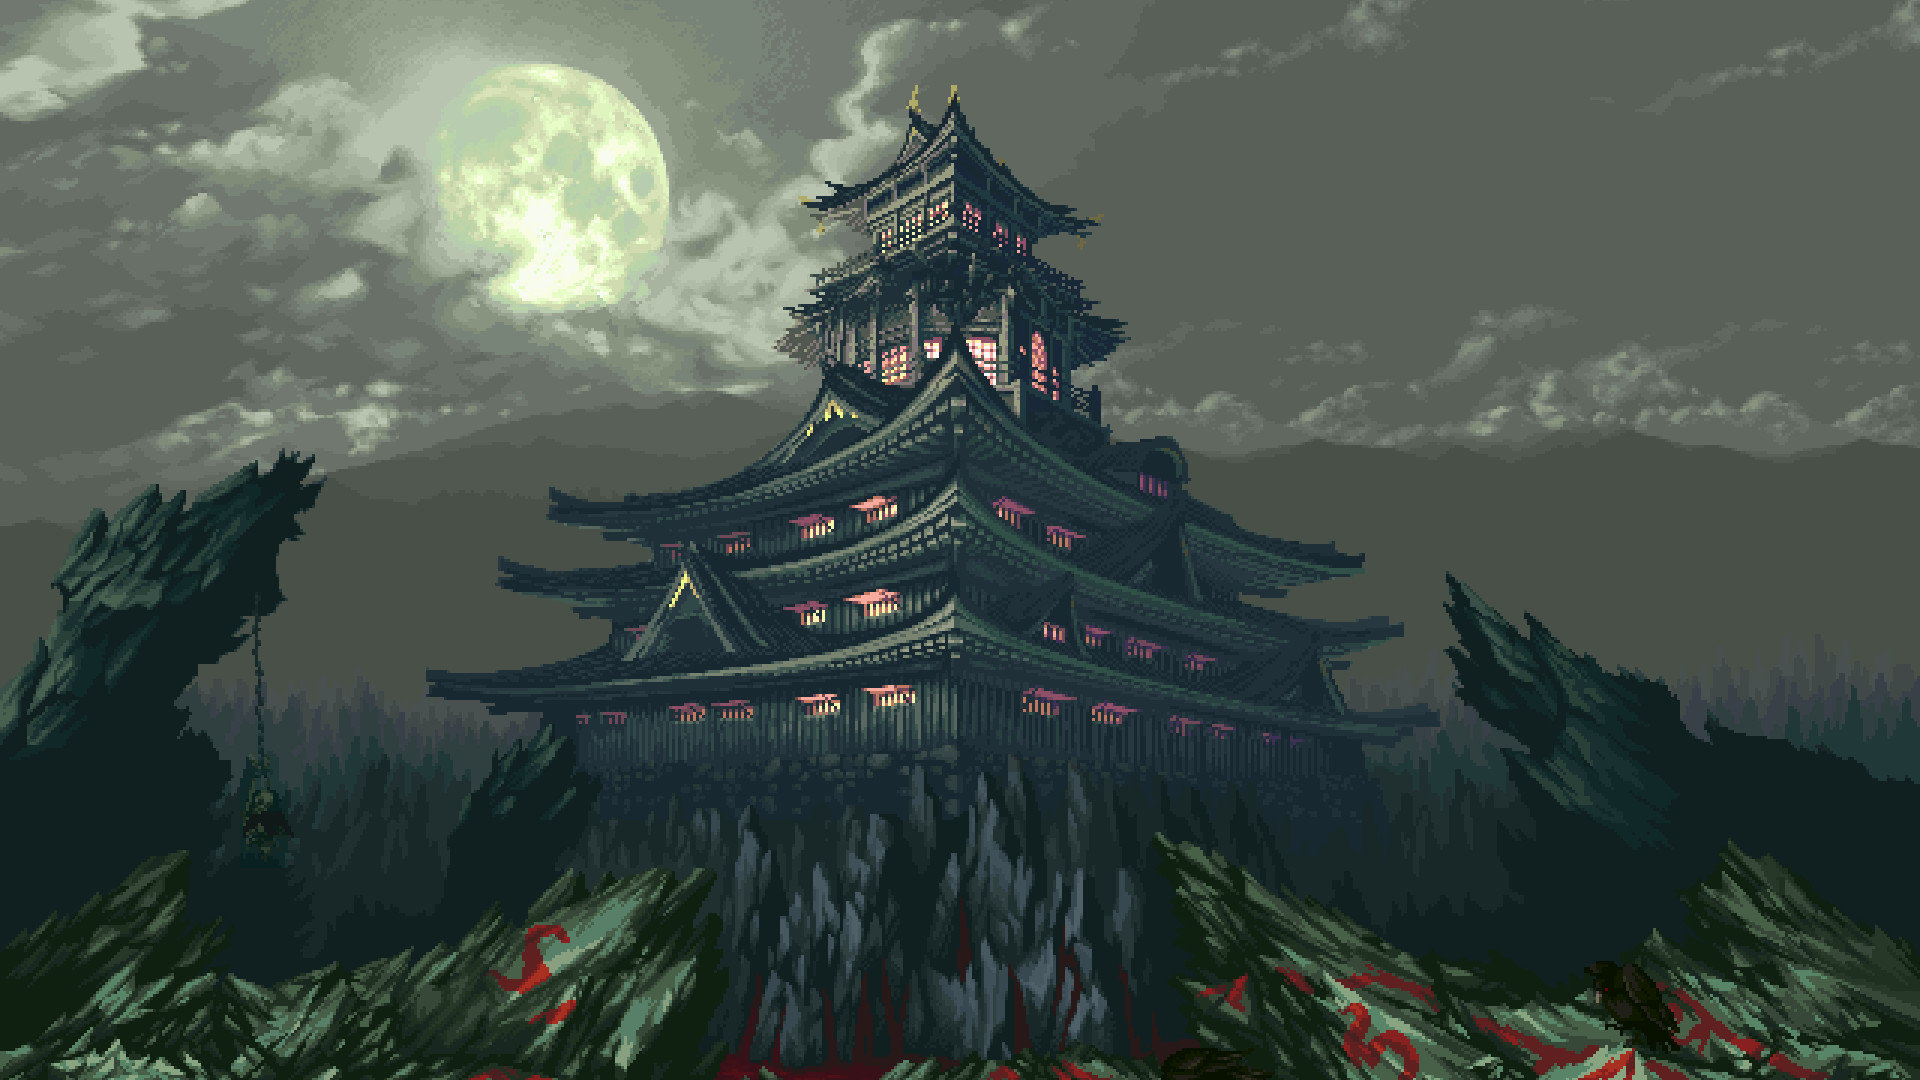 best pixel art wallpaper id:110940 for high resolution full hd